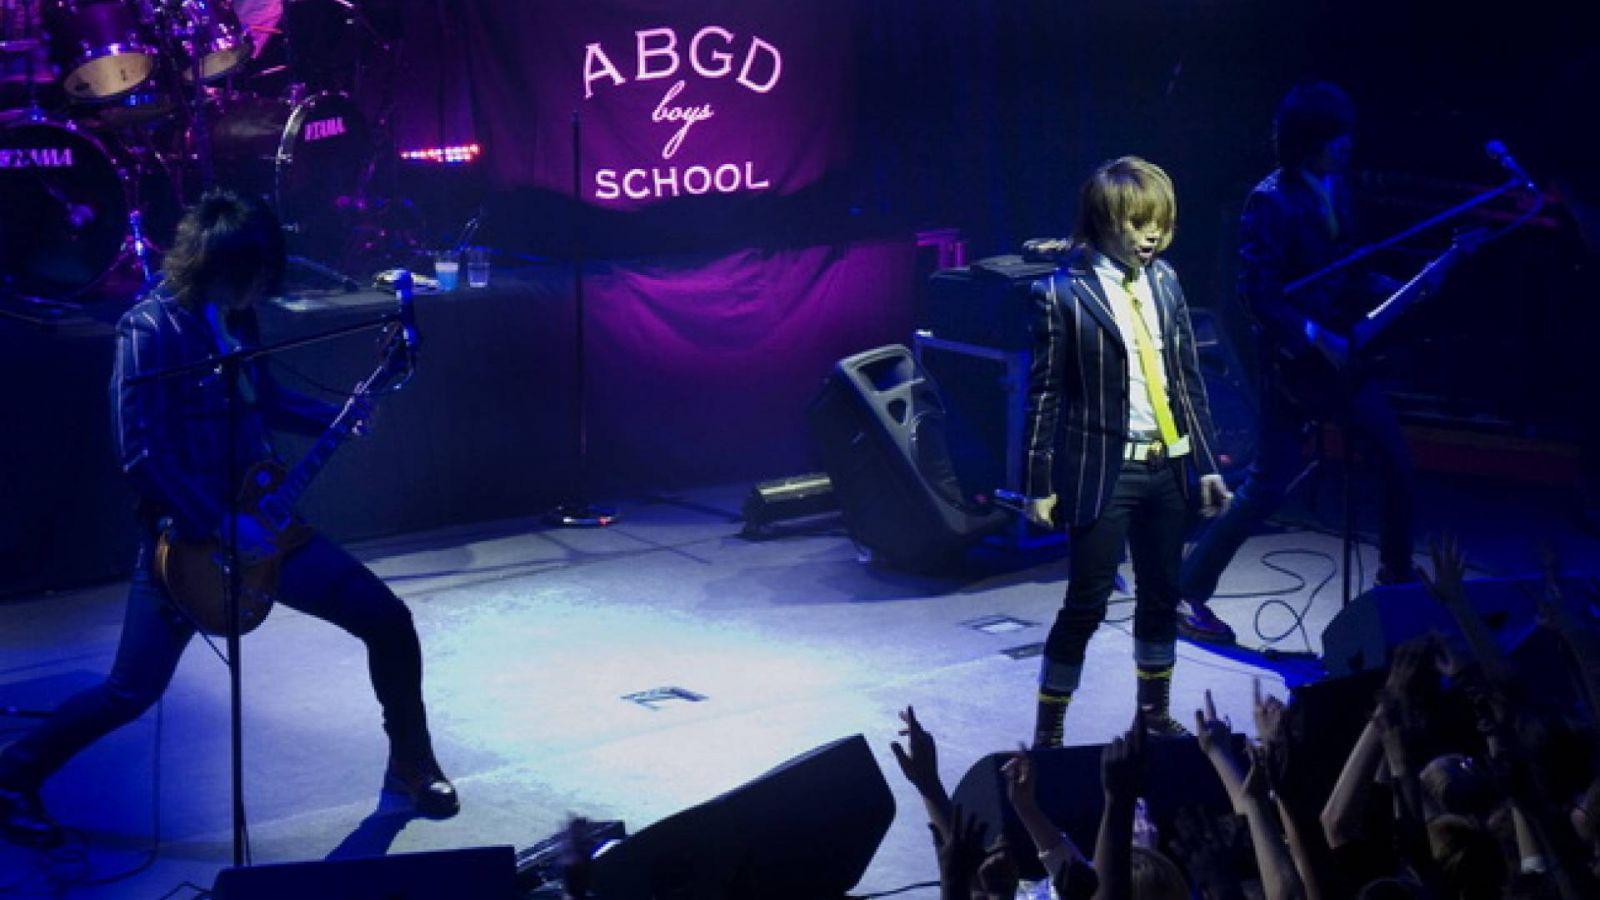 Концерт abingdon boys school в Москве © JaME